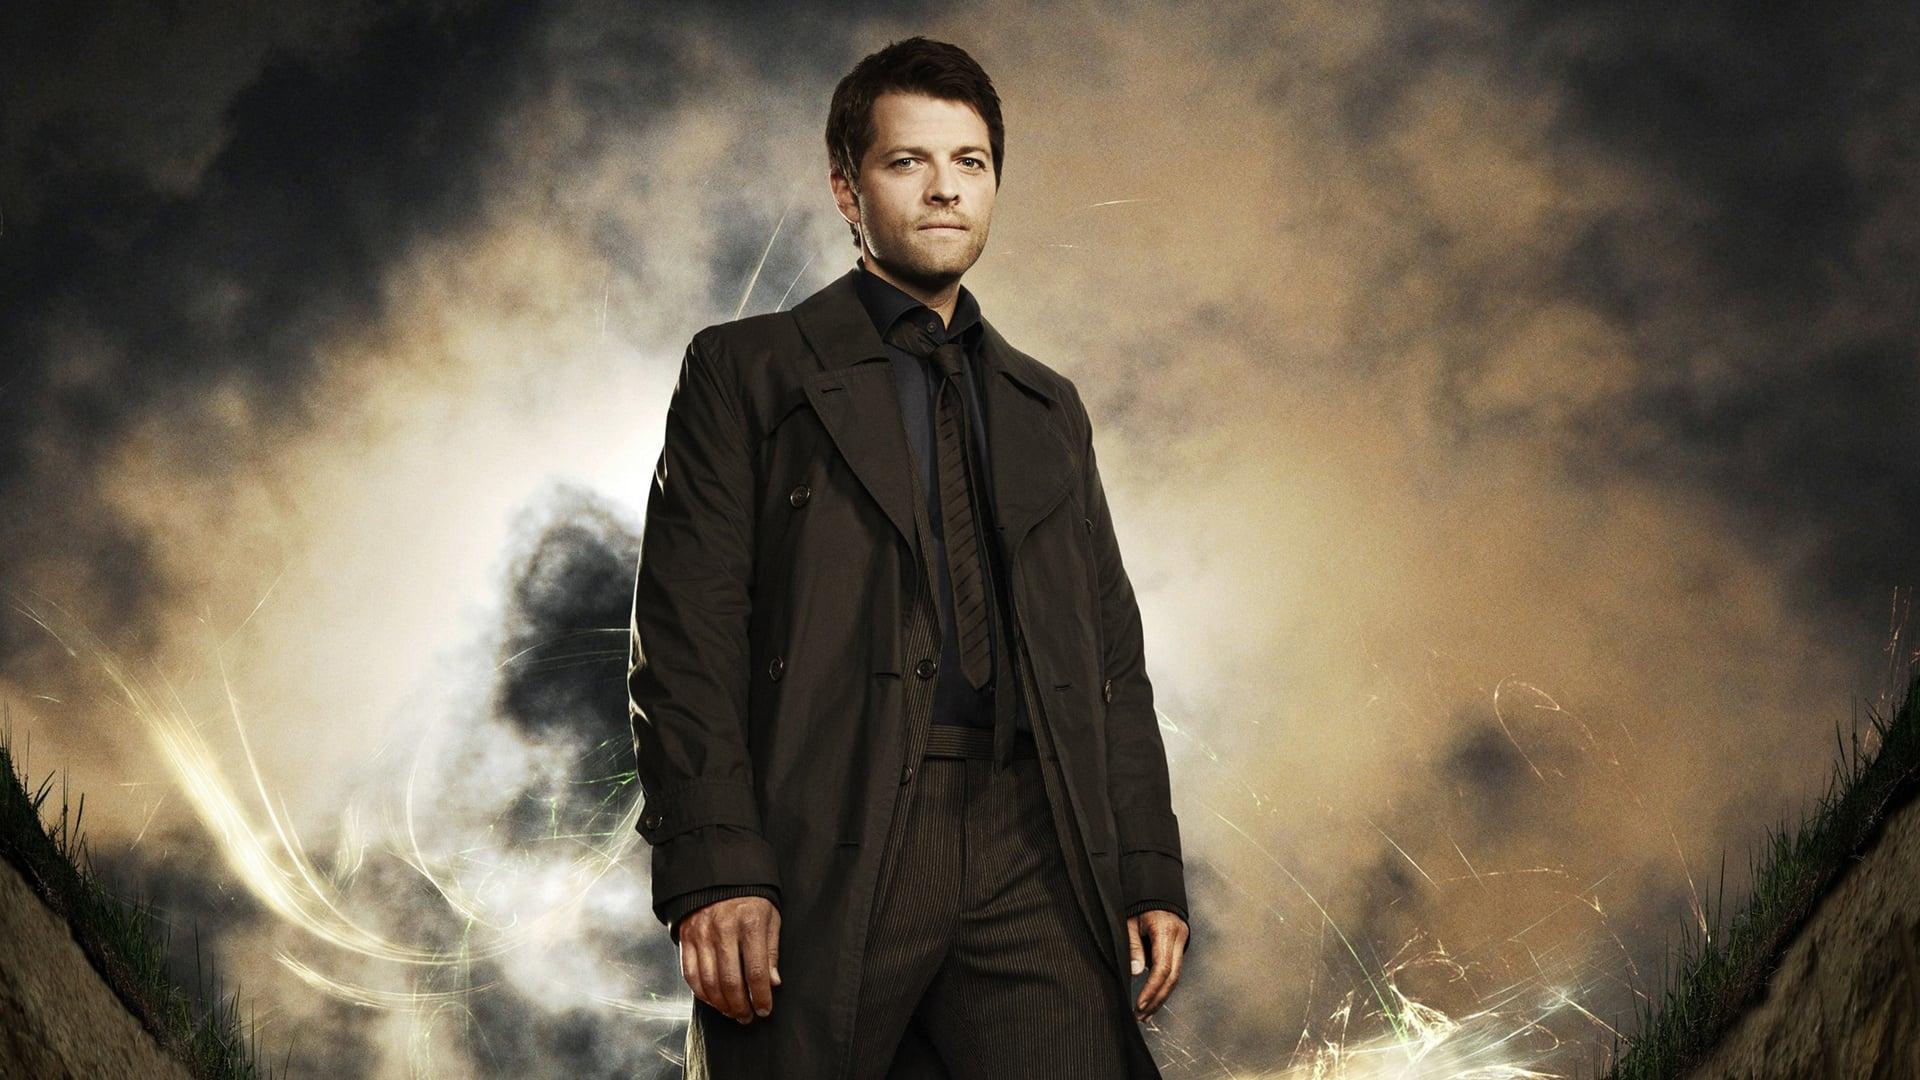 Supernatural - Season 12 Episode 22 Who We Are